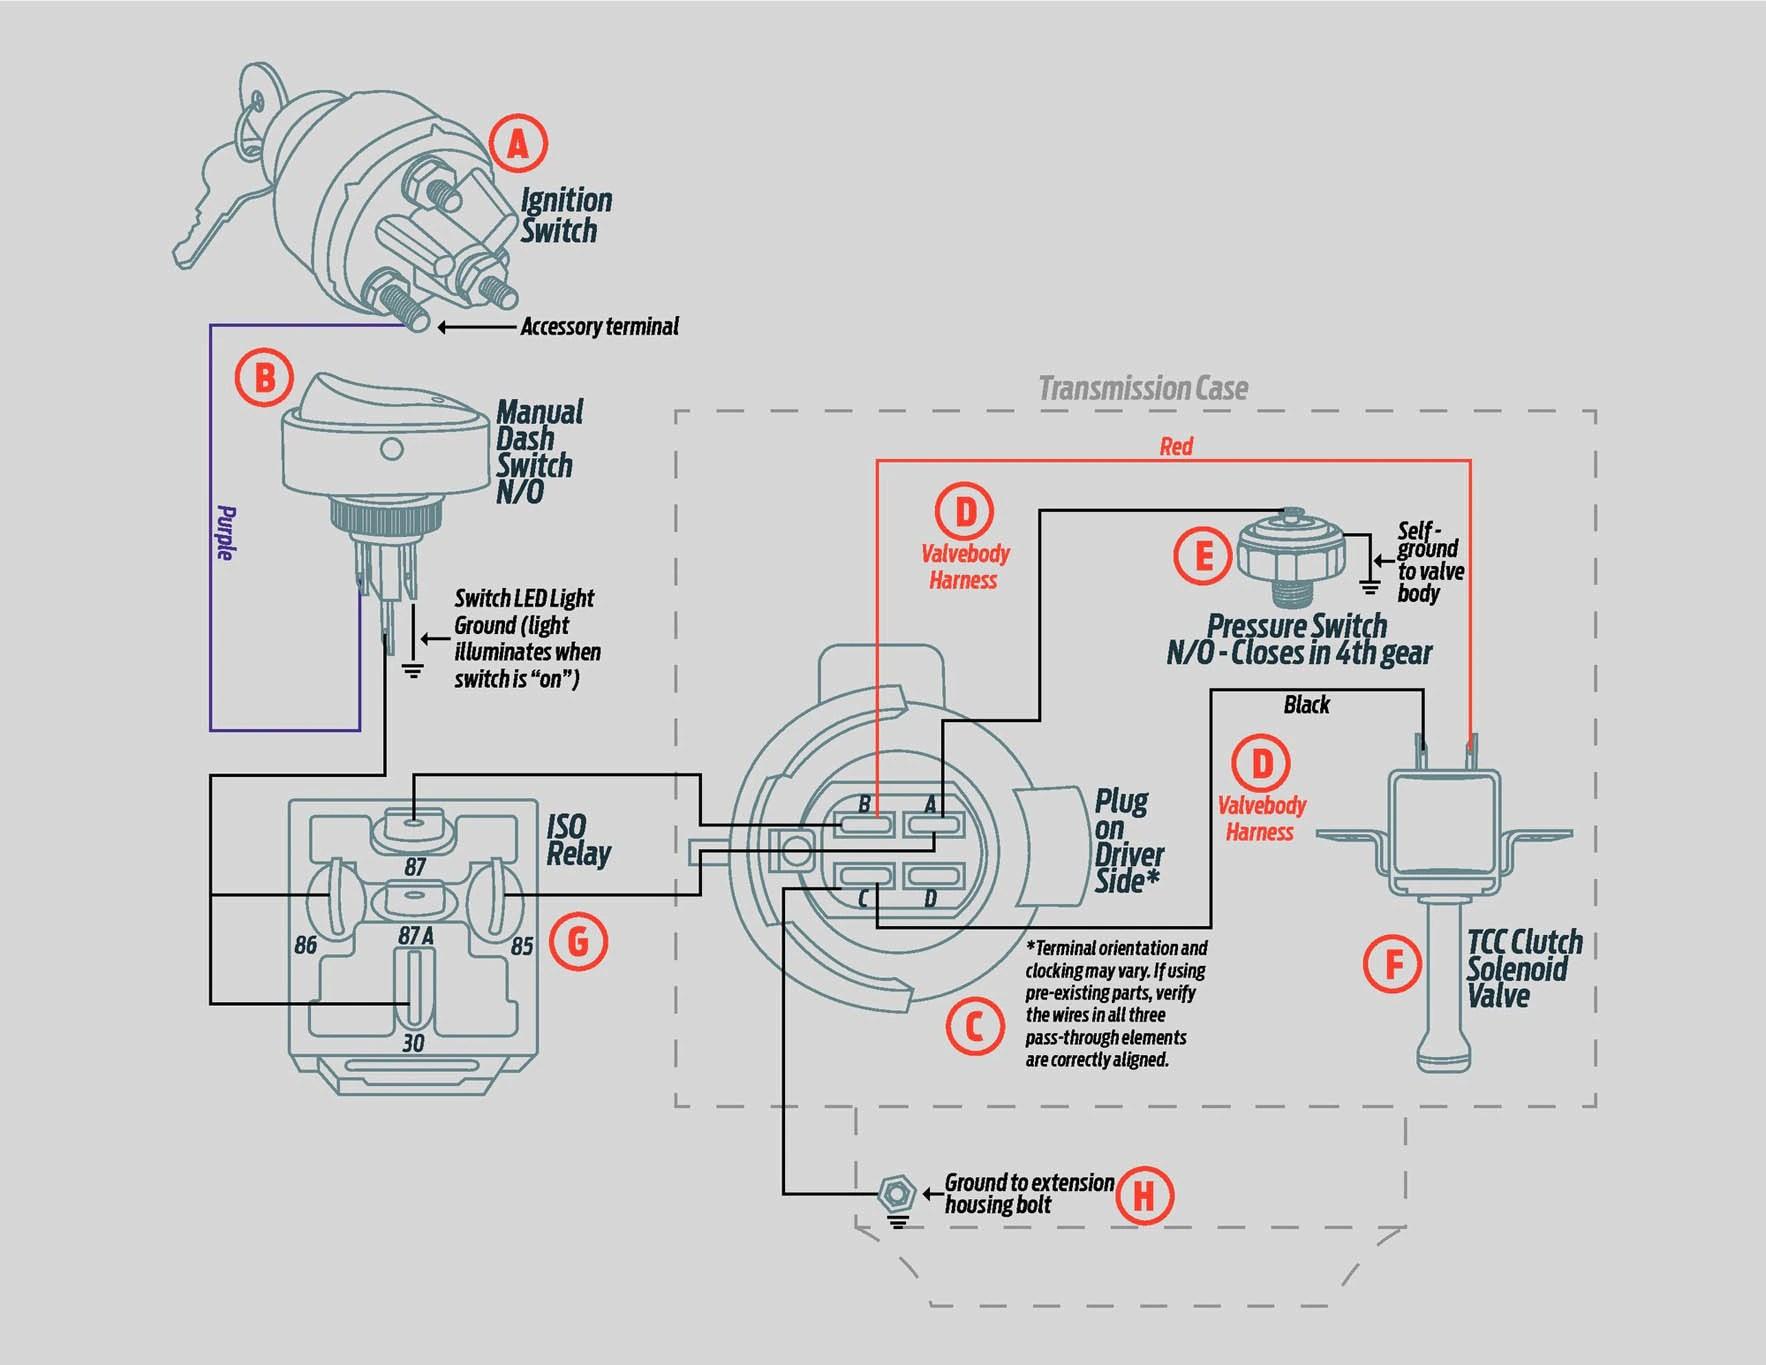 Magnificent Jcb Circuit Diagrams Ensign - Simple Wiring Diagram ...